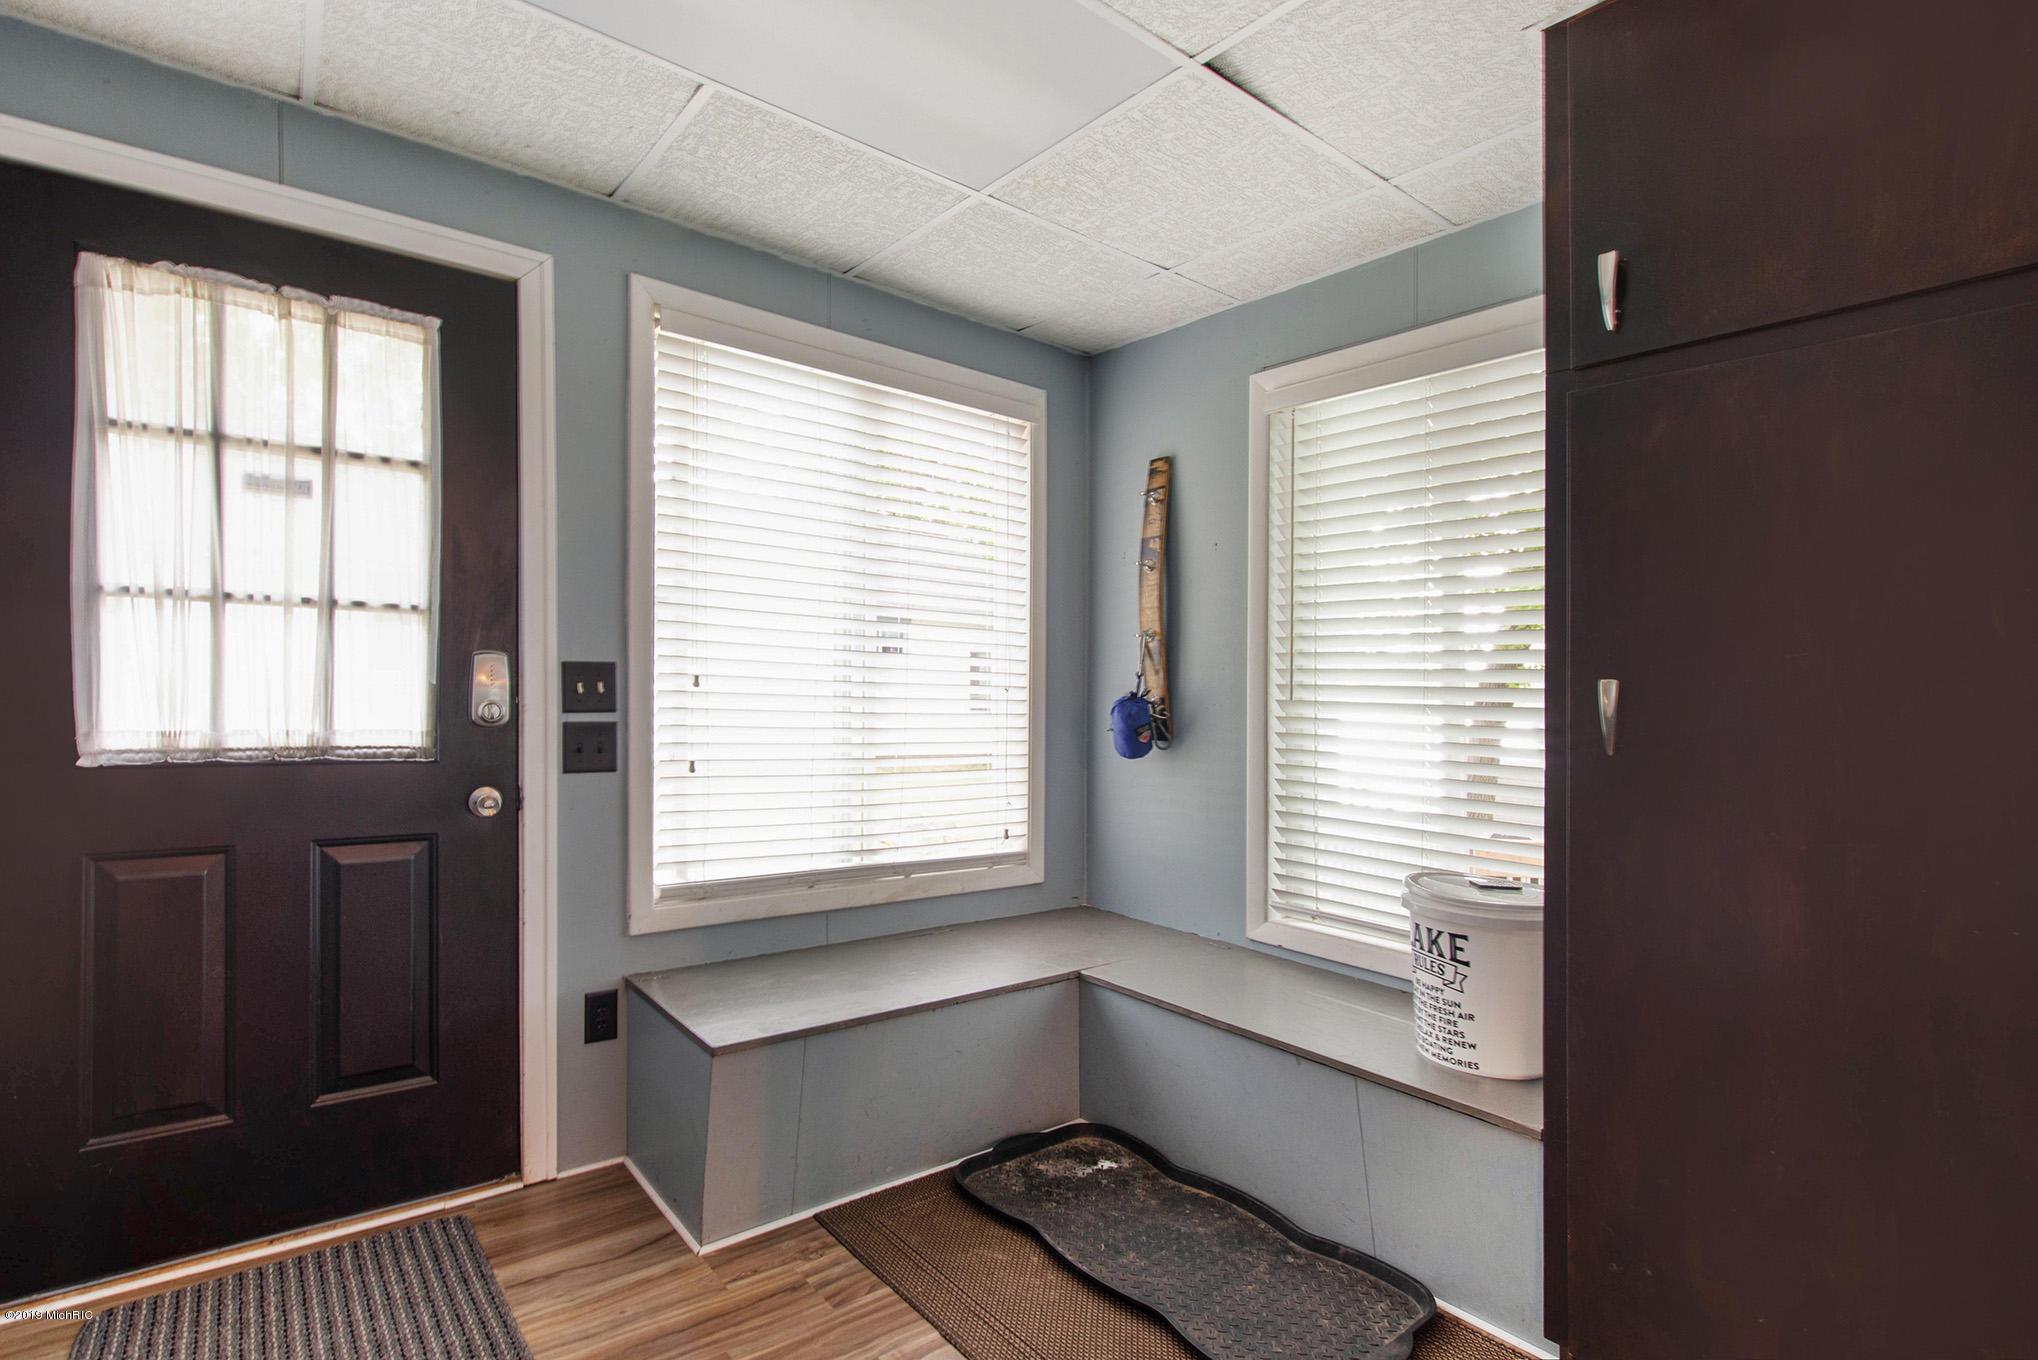 Mud room - entry